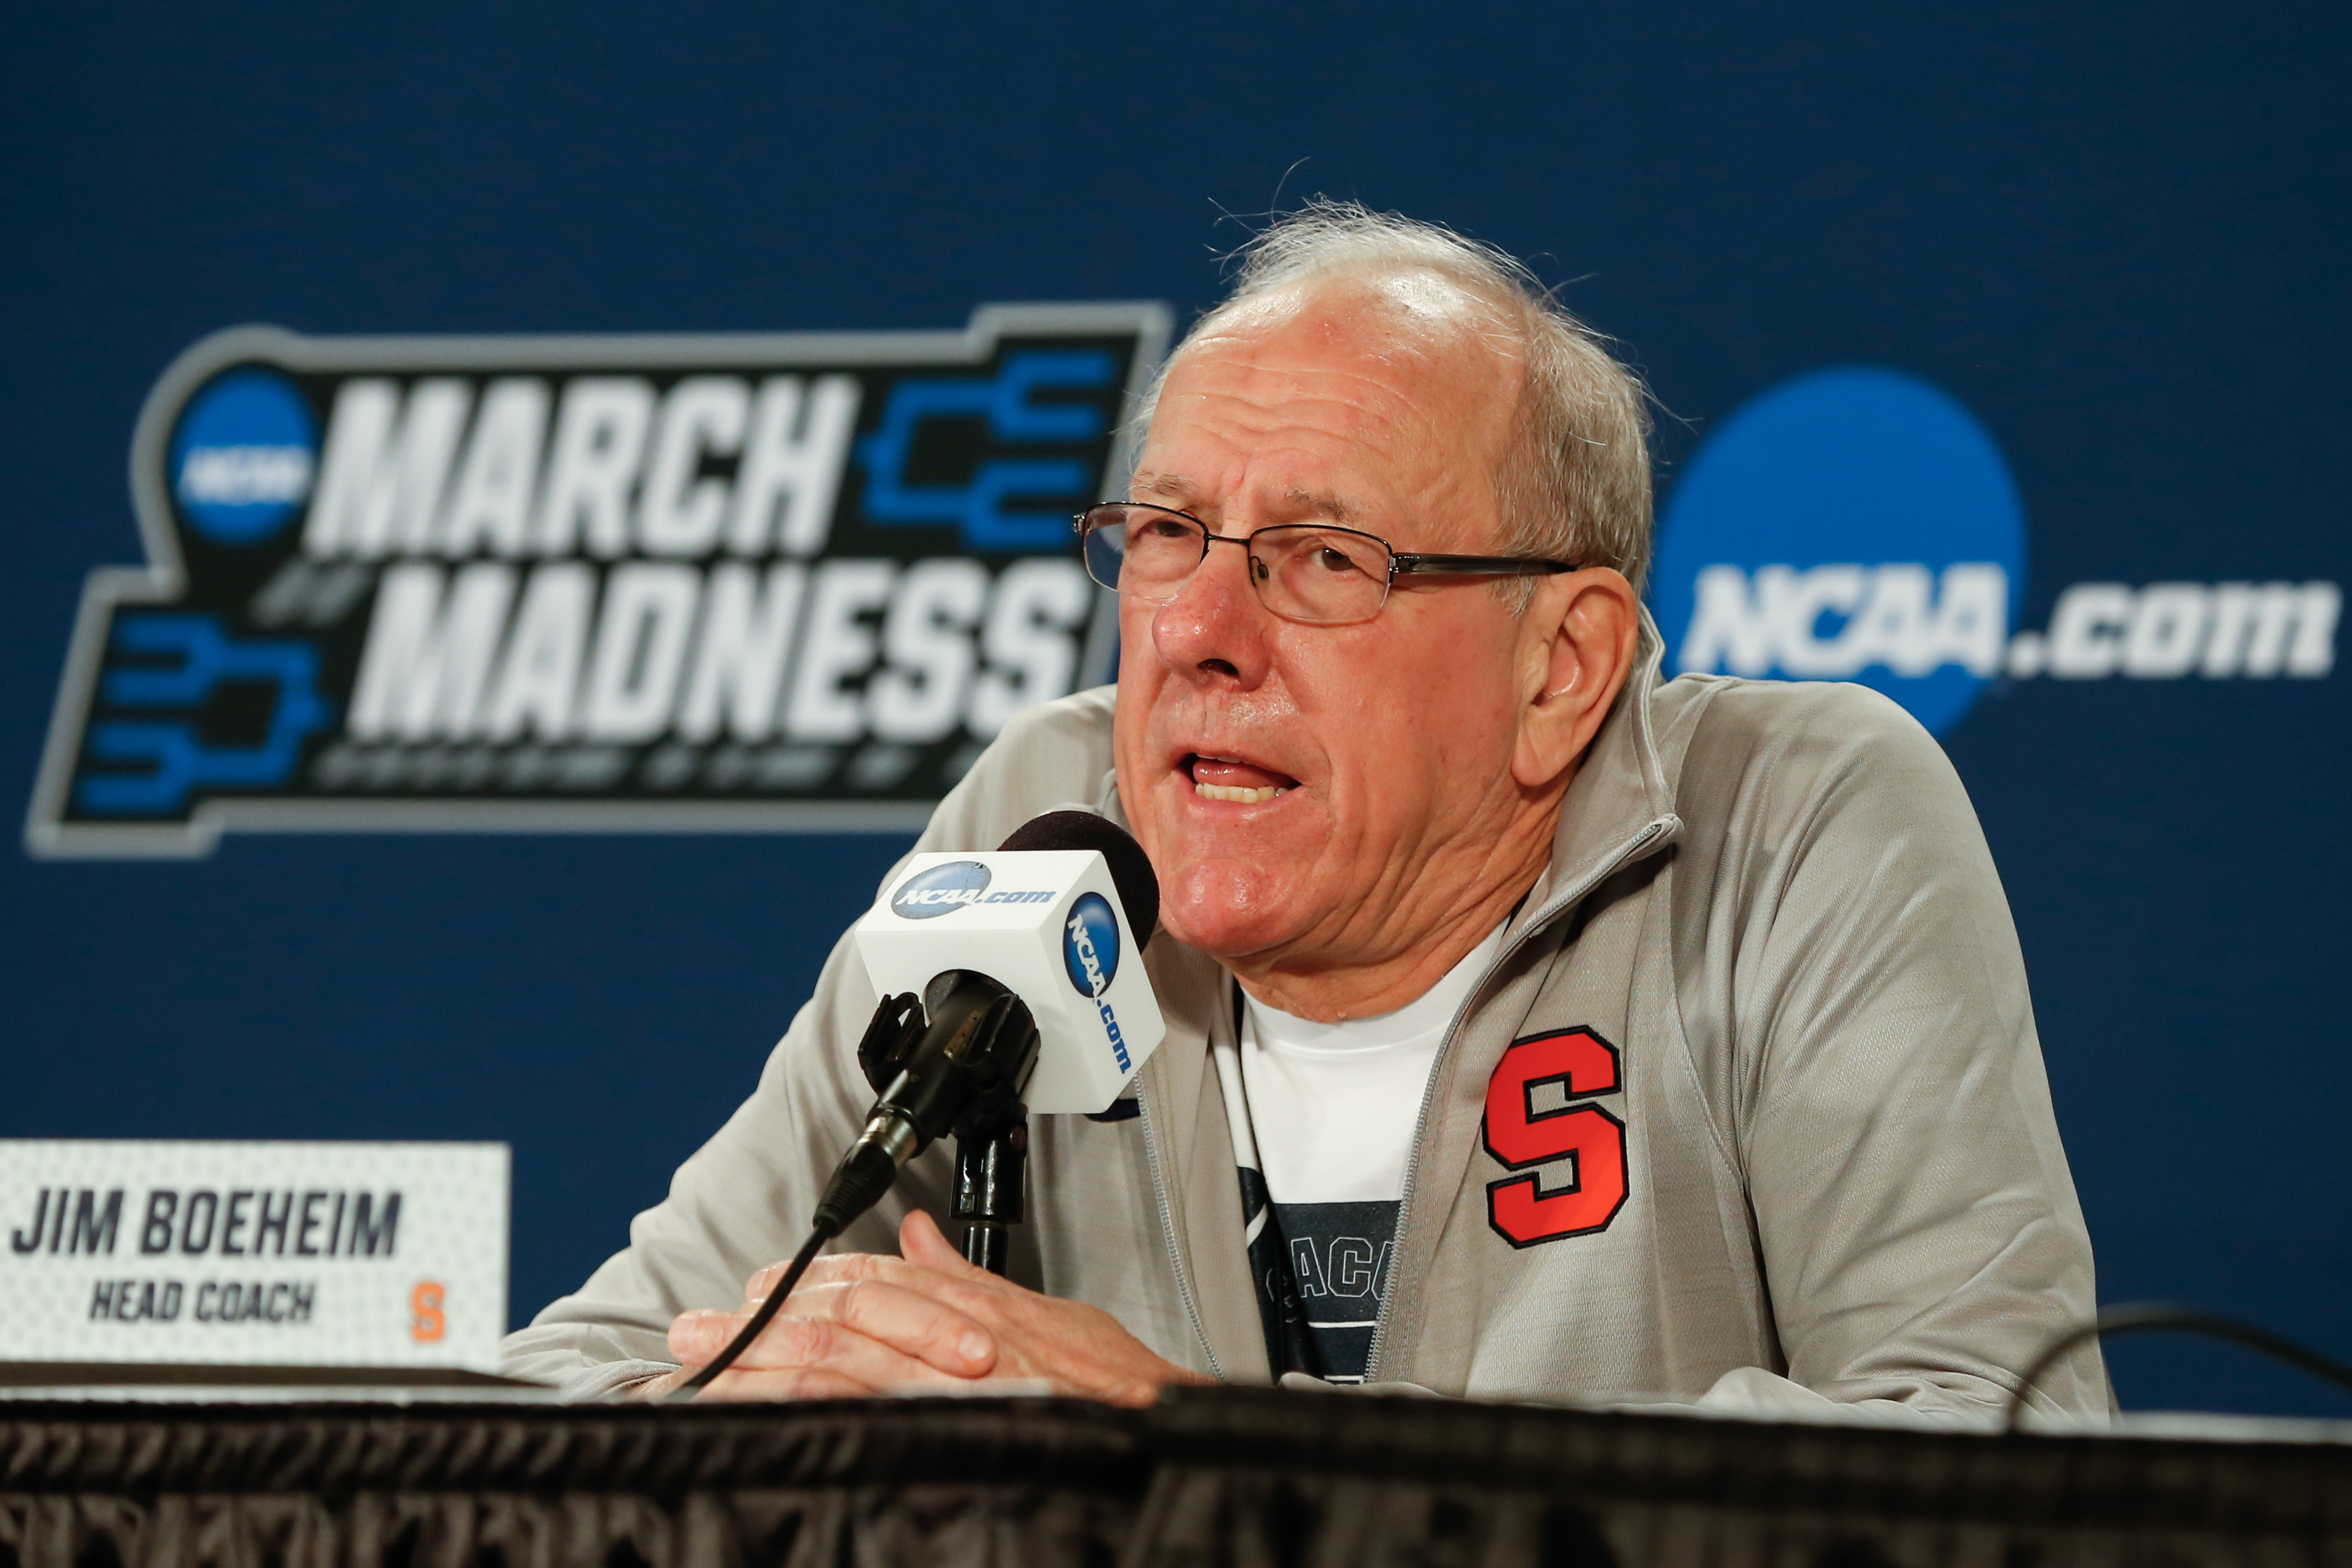 NCAA BASKETBALL: MAR 15 Div I Men's Championship - Syracuse Press Conference